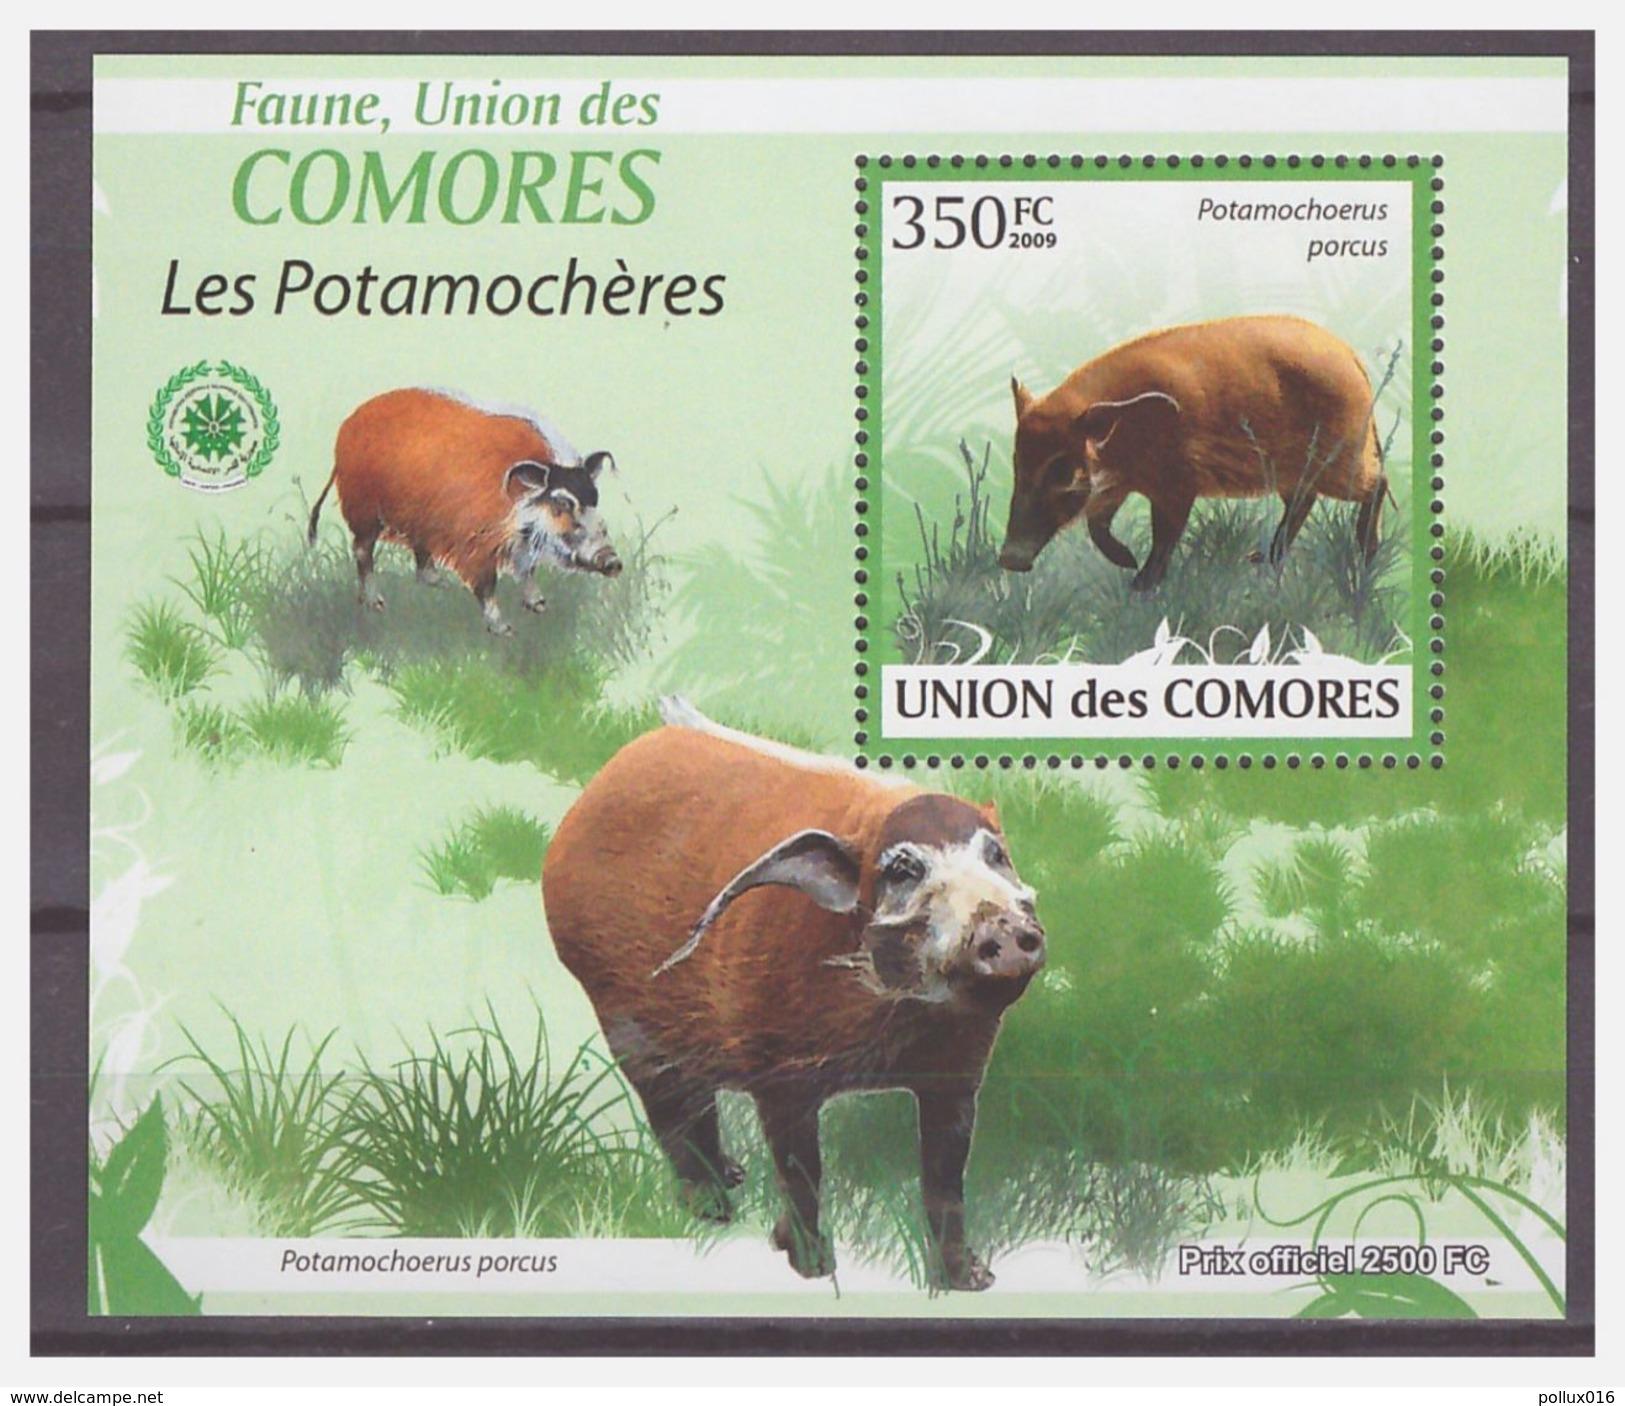 0308 Comores 2009 Varken Zwijn Pig Boar S/S MNH - Timbres